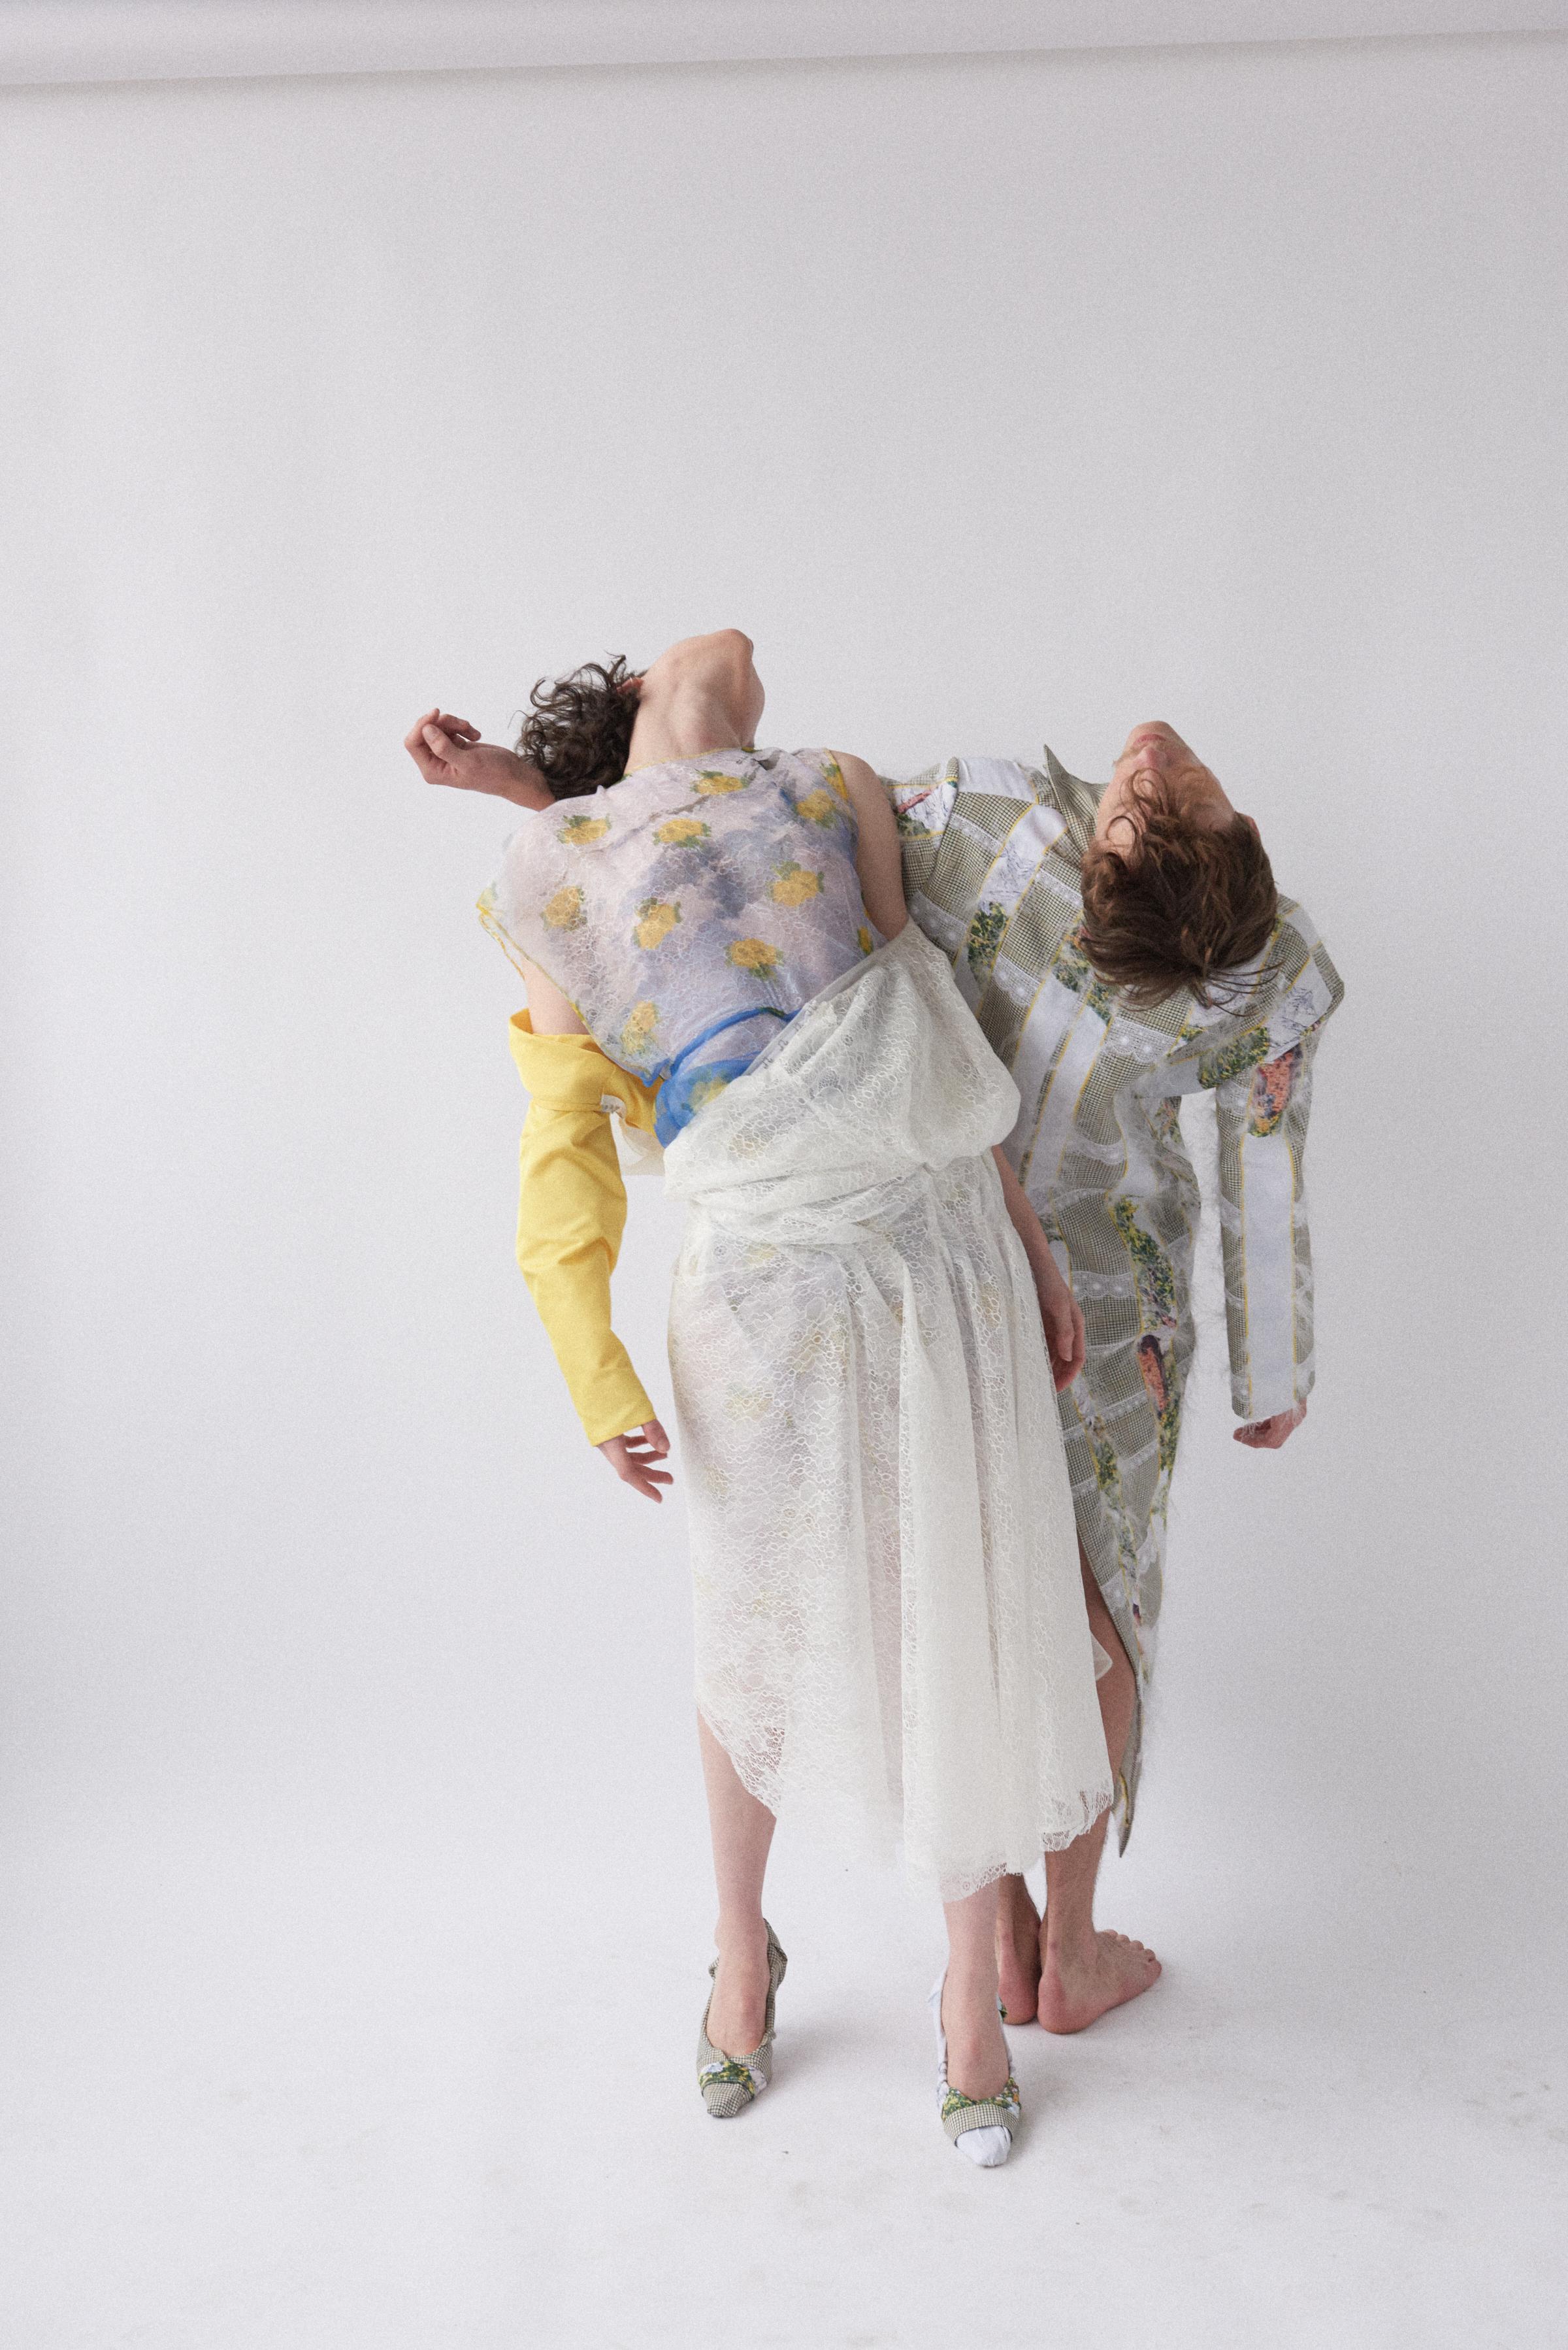 PHOTOS BY DANIEL CAVANAUGH  MAKEUP BY MIKI ISHIKURA